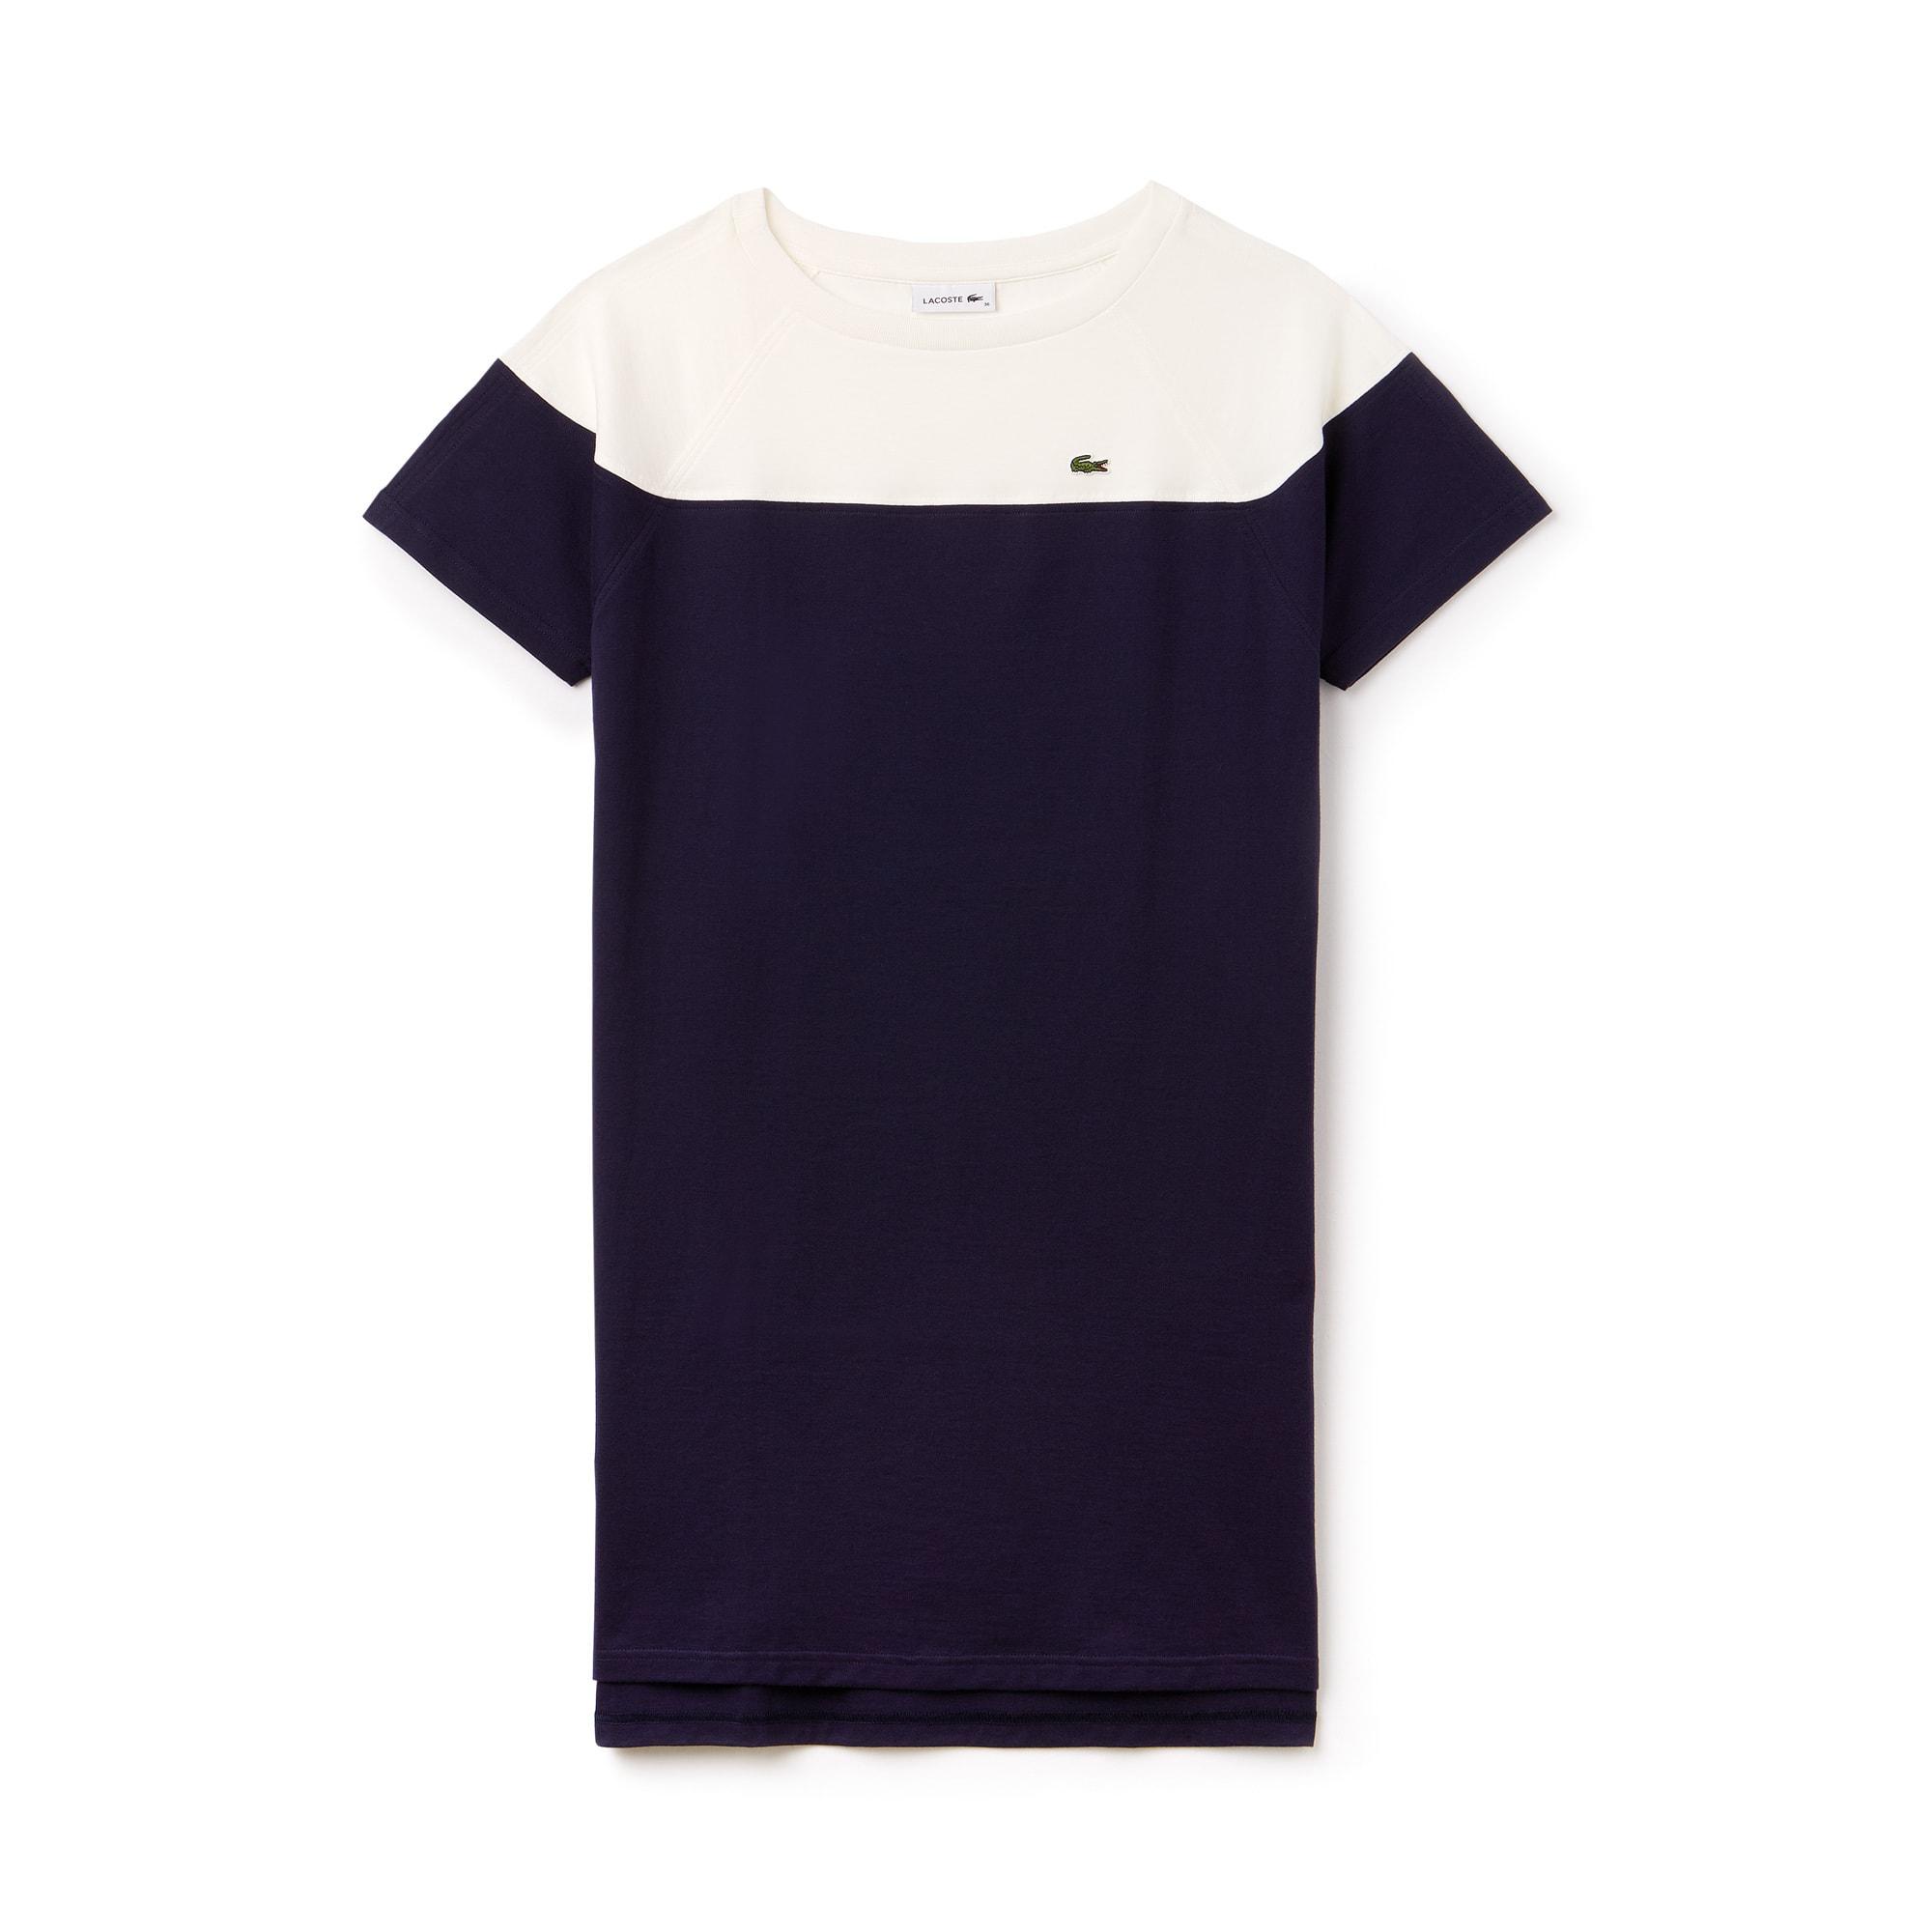 Robe t-shirt col bâteau en jersey de coton color block